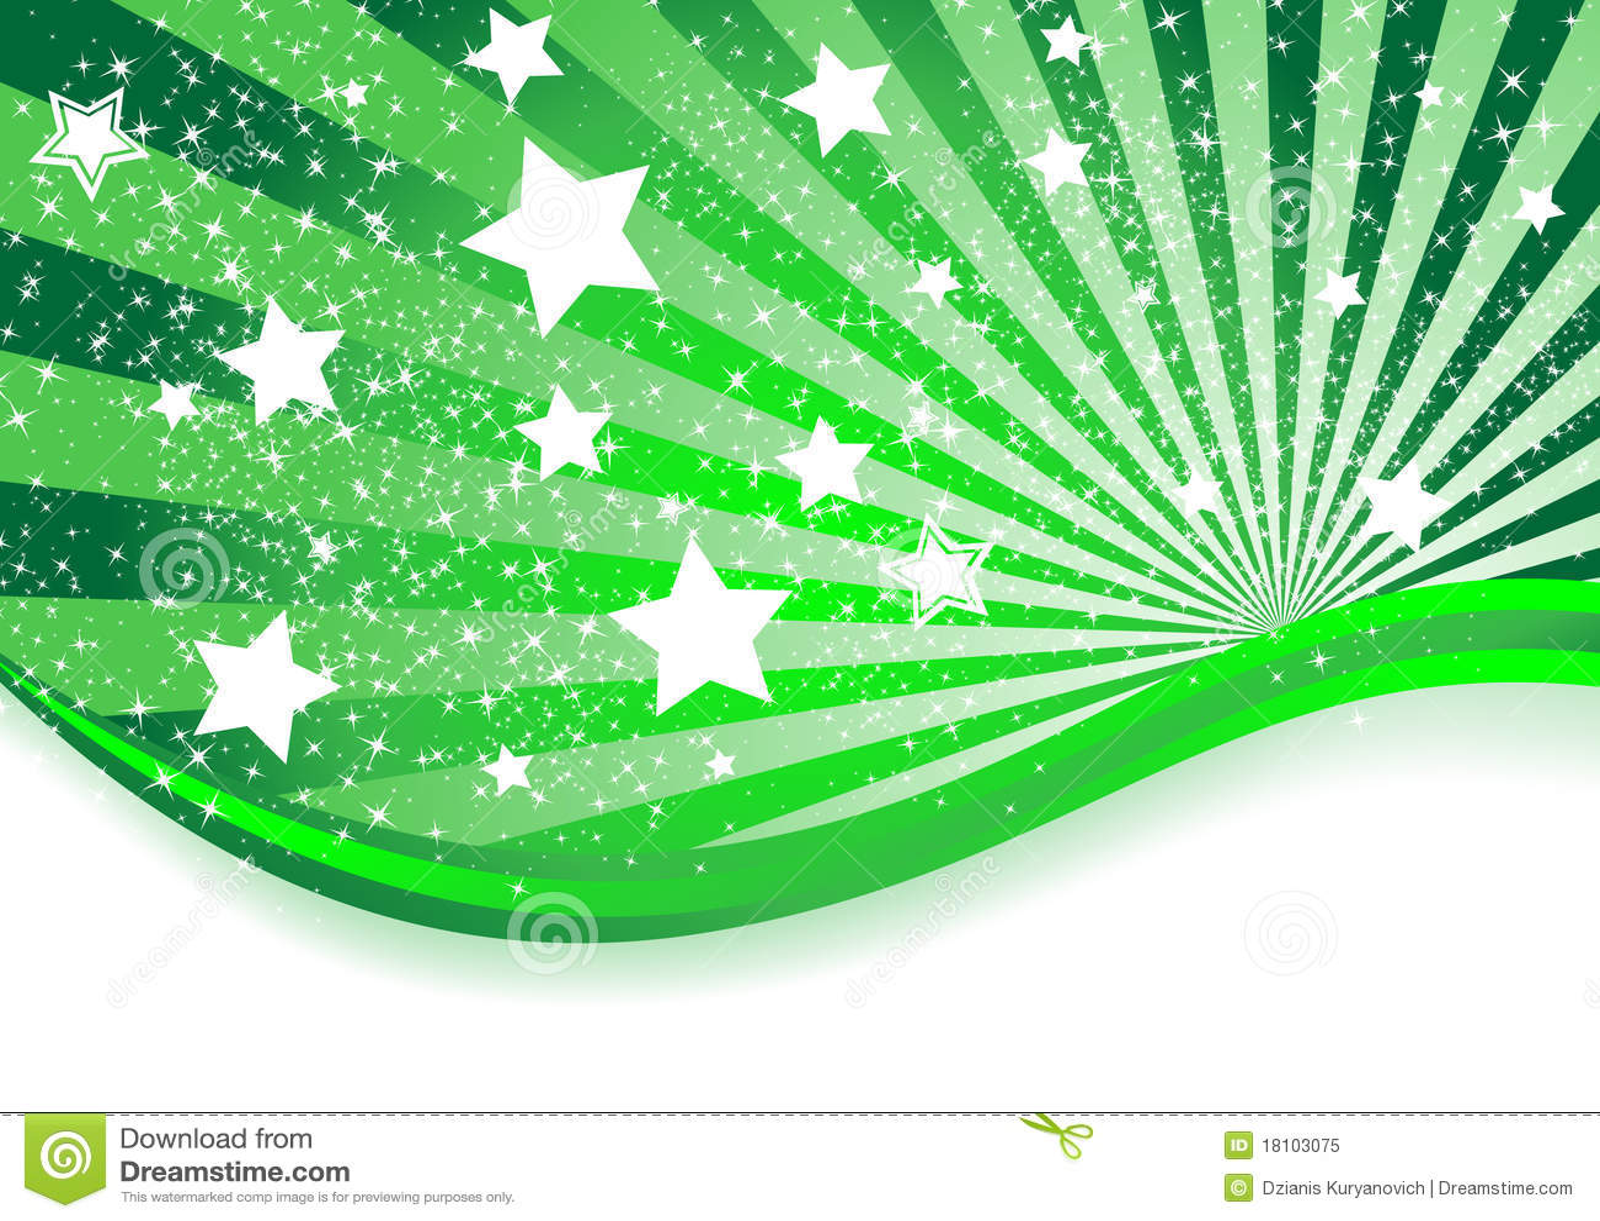 Foto De Stock Royalty Free Vetor Fundo Verde Abstrato